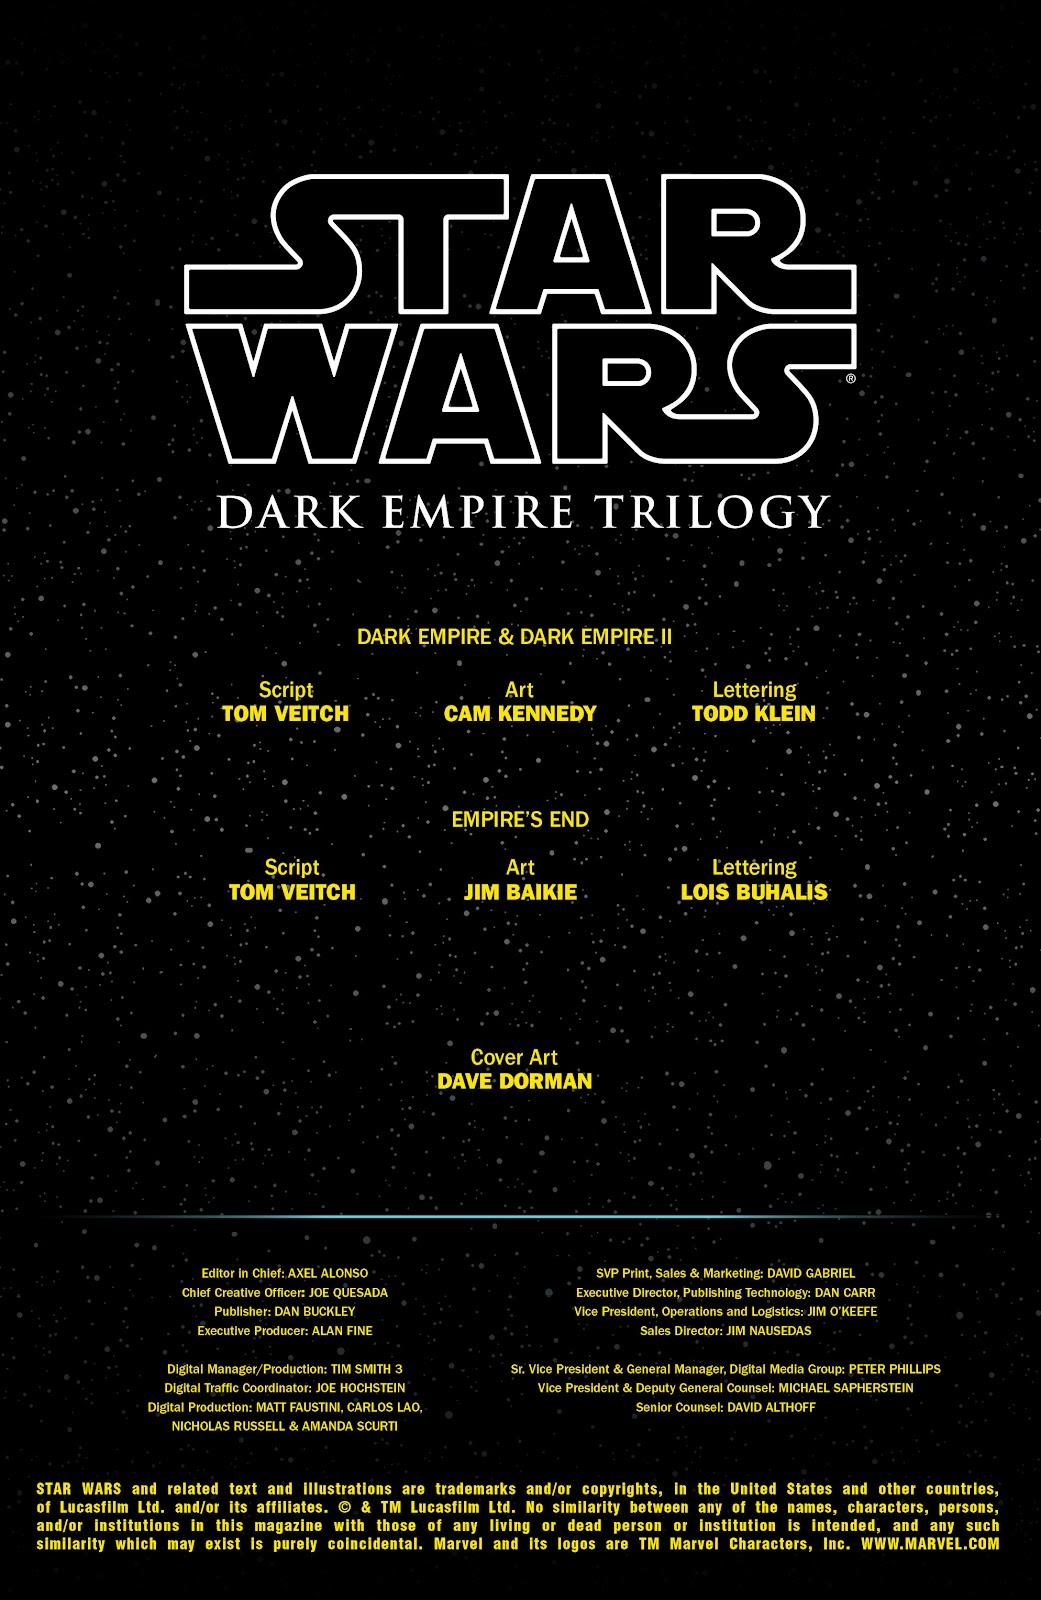 Read online Star Wars: Dark Empire Trilogy comic -  Issue # TPB (Part 1) - 2